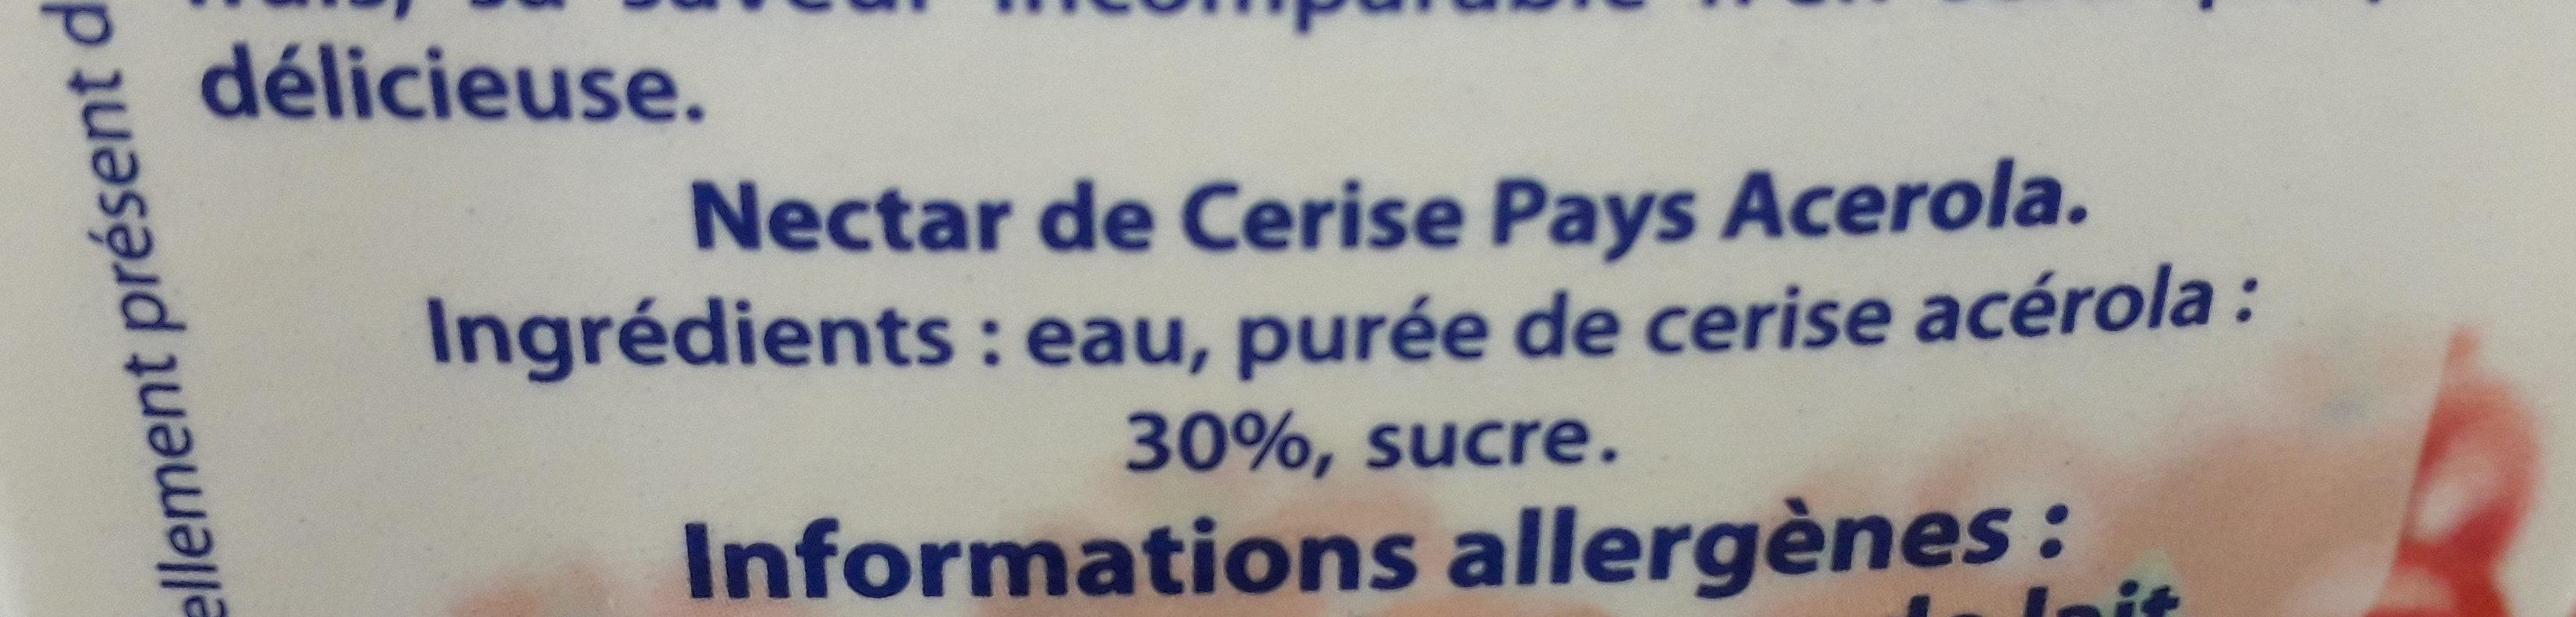 nectar Cerise Pays acerola - Ingredienti - fr